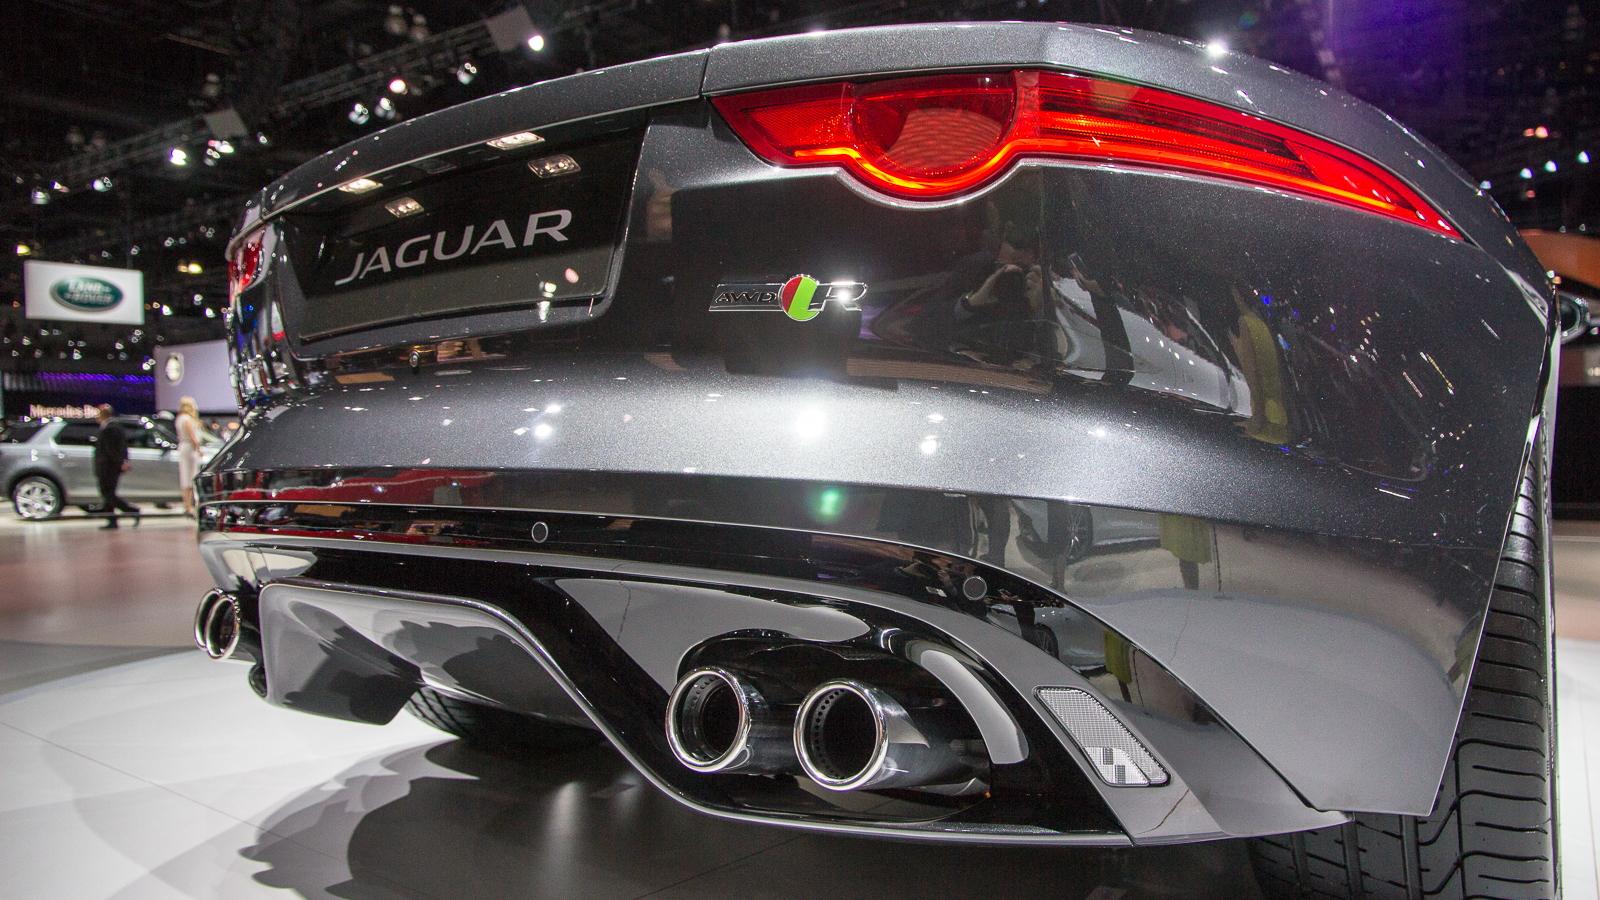 2016 Jaguar F-Type R Coupe All Wheel Drive, 2014 Los Angeles Auto Show